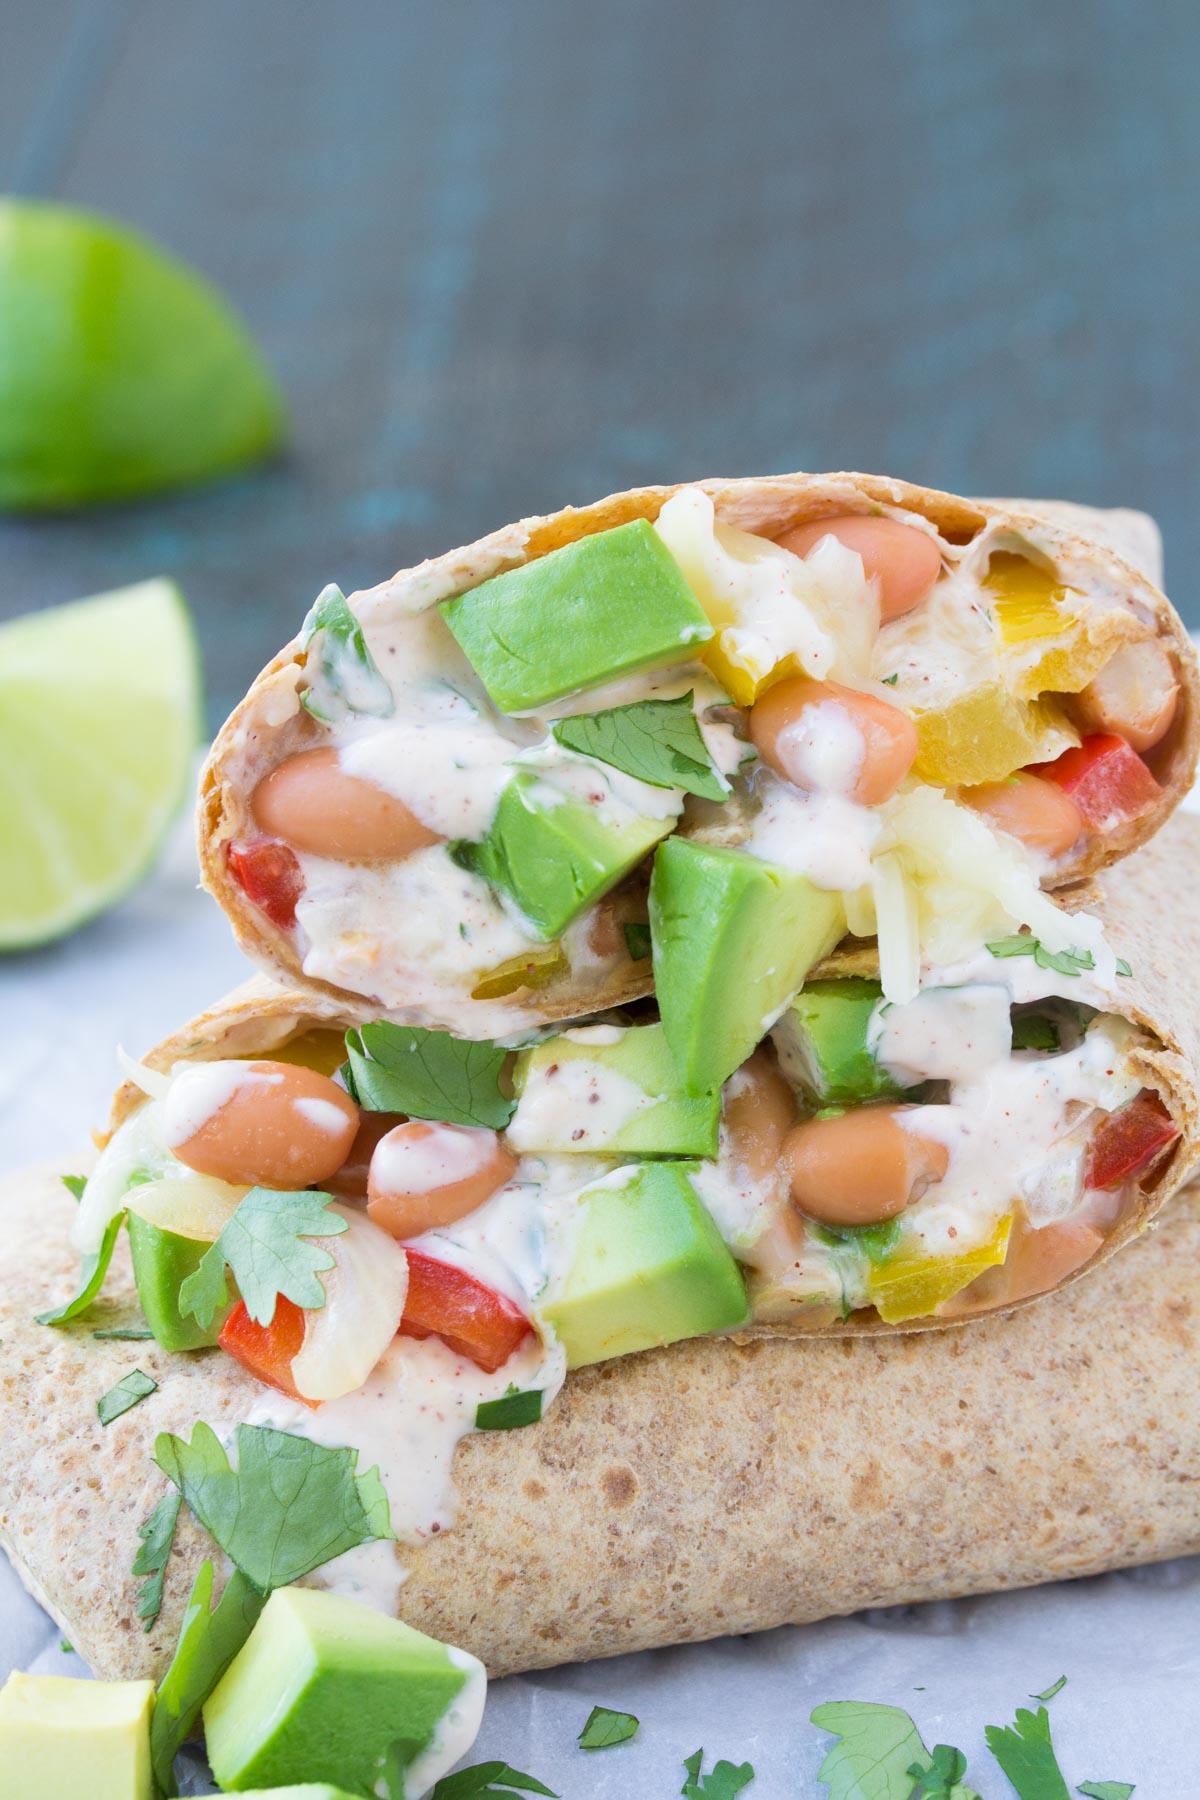 These Creamy Avocado Vegetarian Burritos are a healthy 30 minute dinner recipe! | www.kristineskitchenblog.com